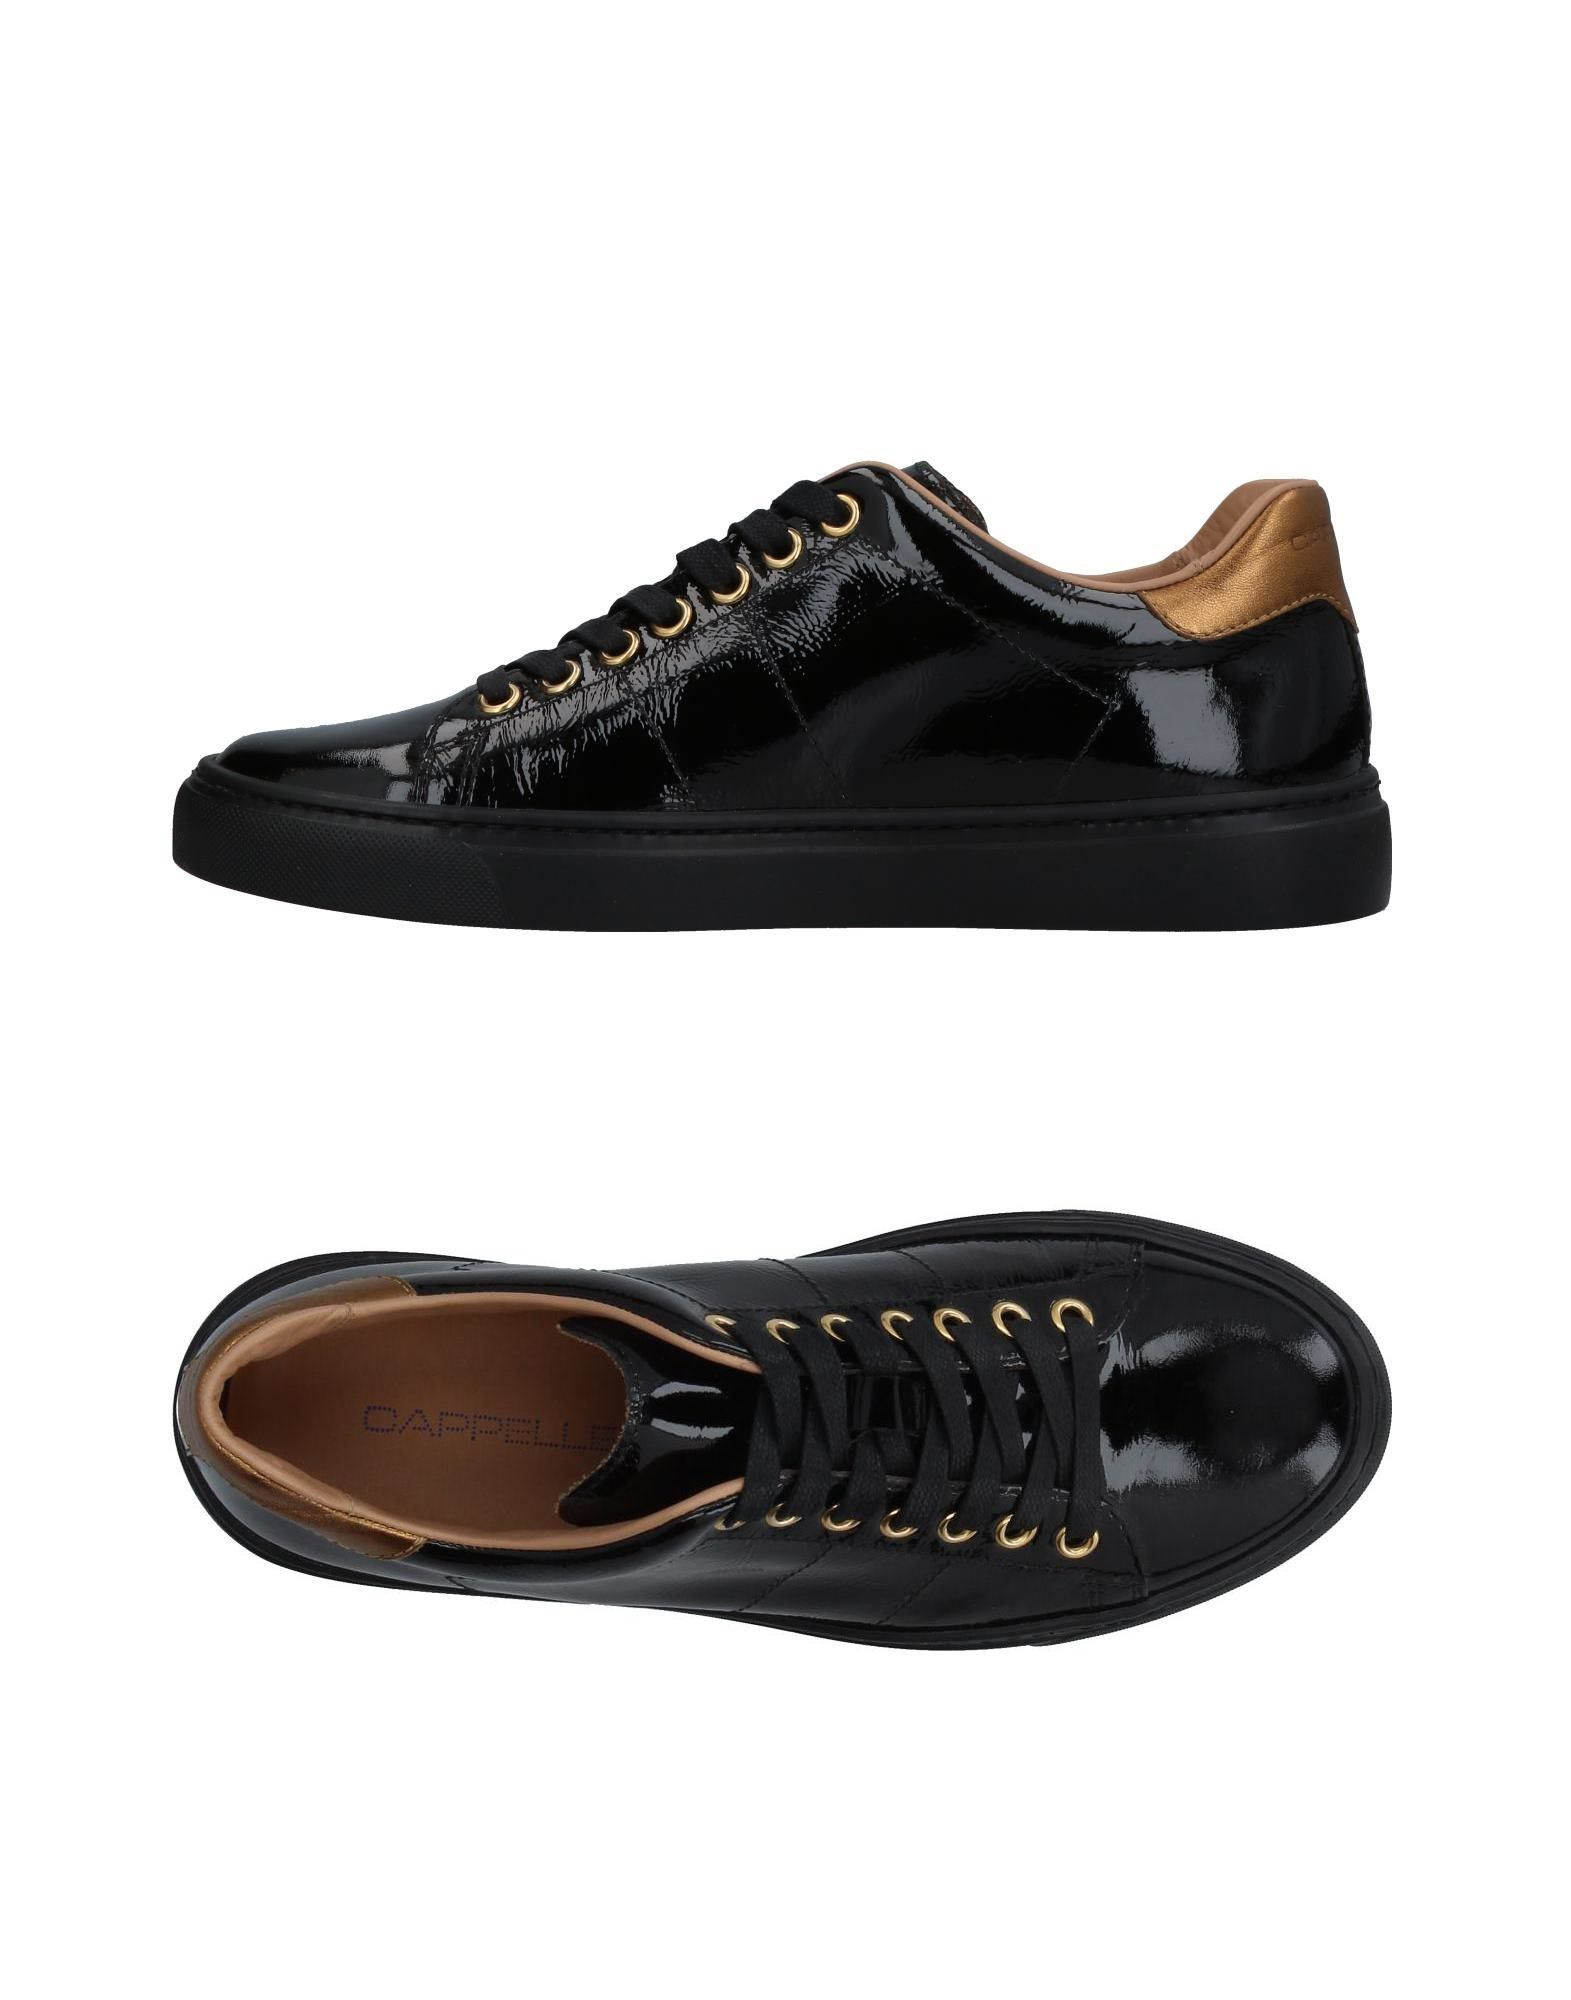 Cappelletti Sneakers Damen  11387824AJ Gute Qualität beliebte Schuhe